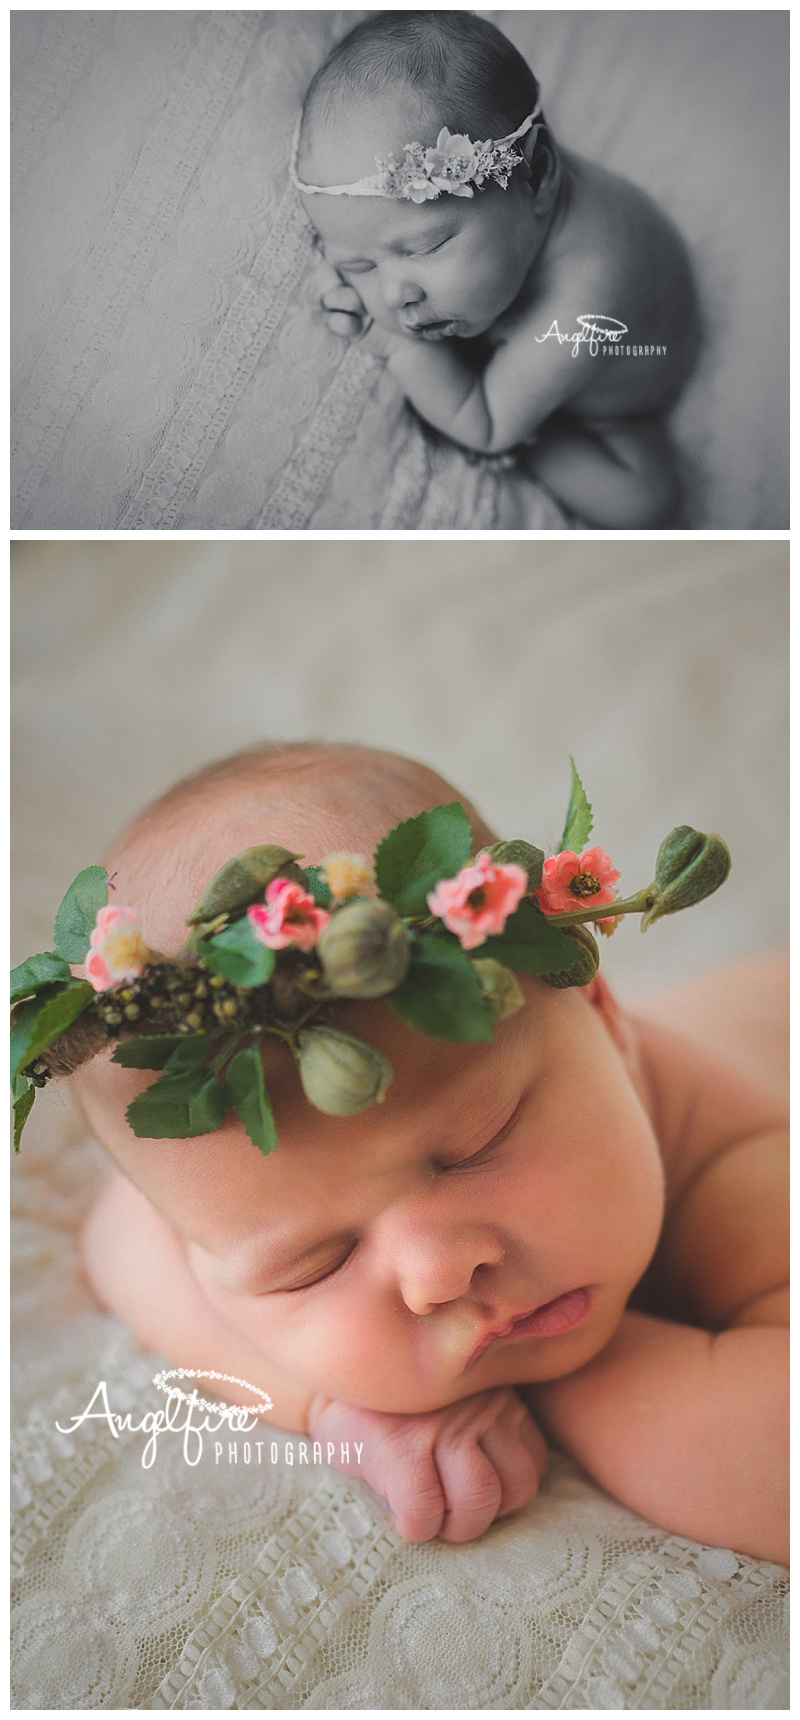 West Midlands Newborn Photographer | Angelfire Photography | www.angelfirephotography.co.uk 15